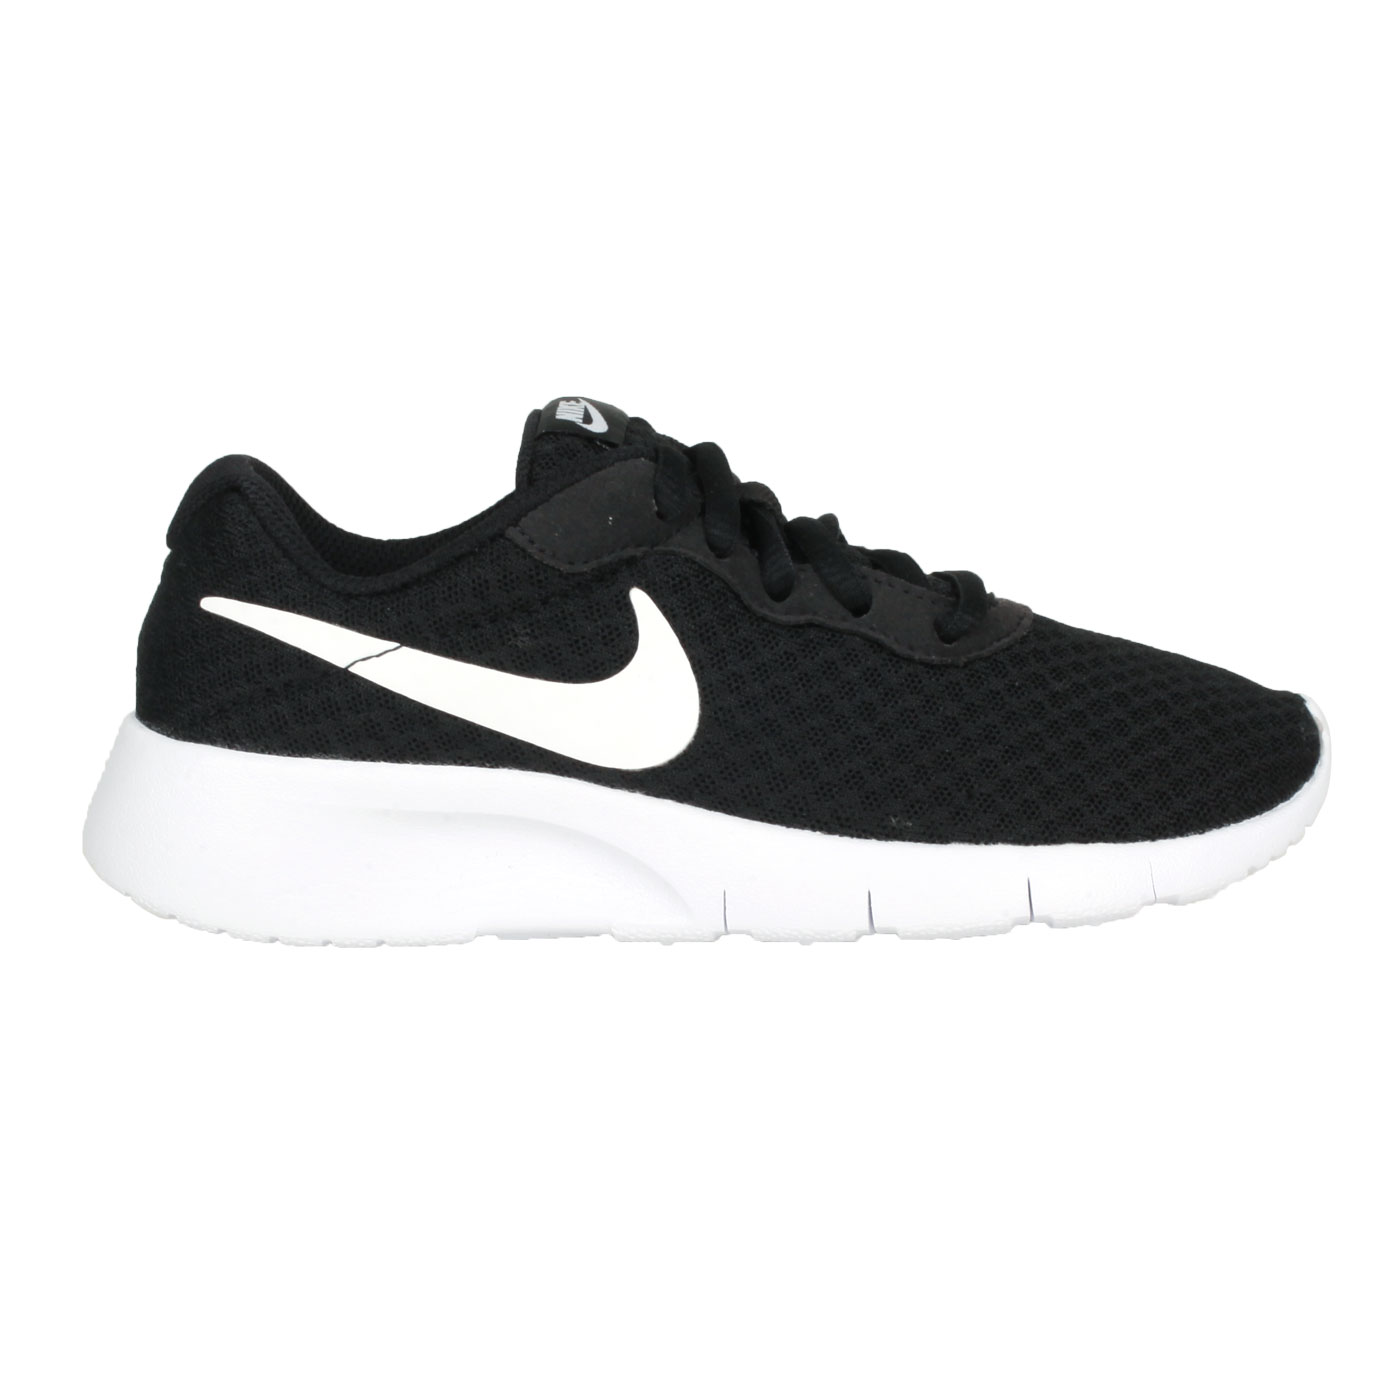 NIKE 中童休閒鞋 @TANJUN (PS)@818382-011 - 黑白